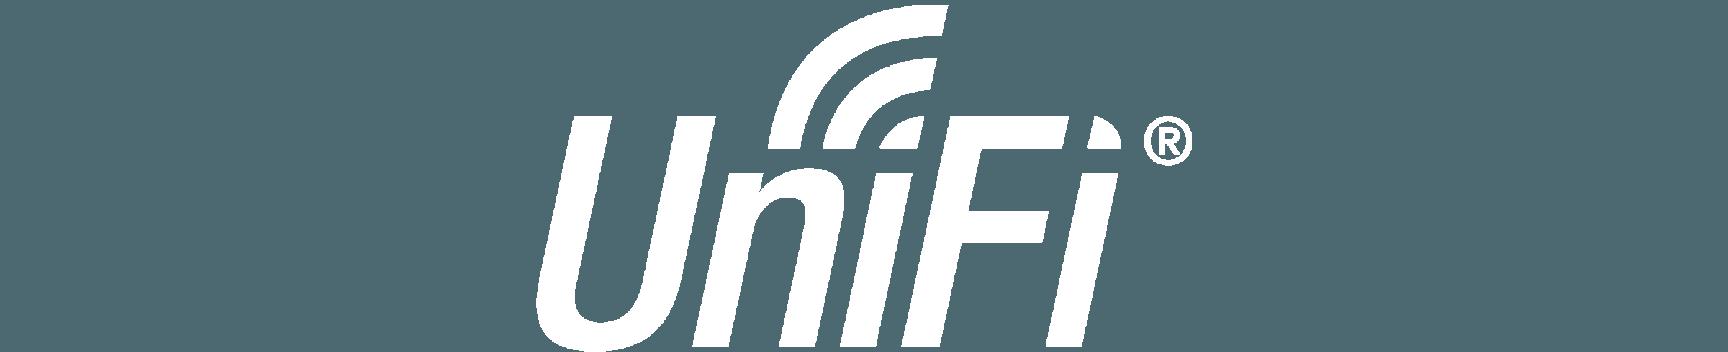 UBNT 台灣總代理 | 藍圈科技 - 專營 UI Unifi Ubiquiti UBNT 無線與有線網路產品 7